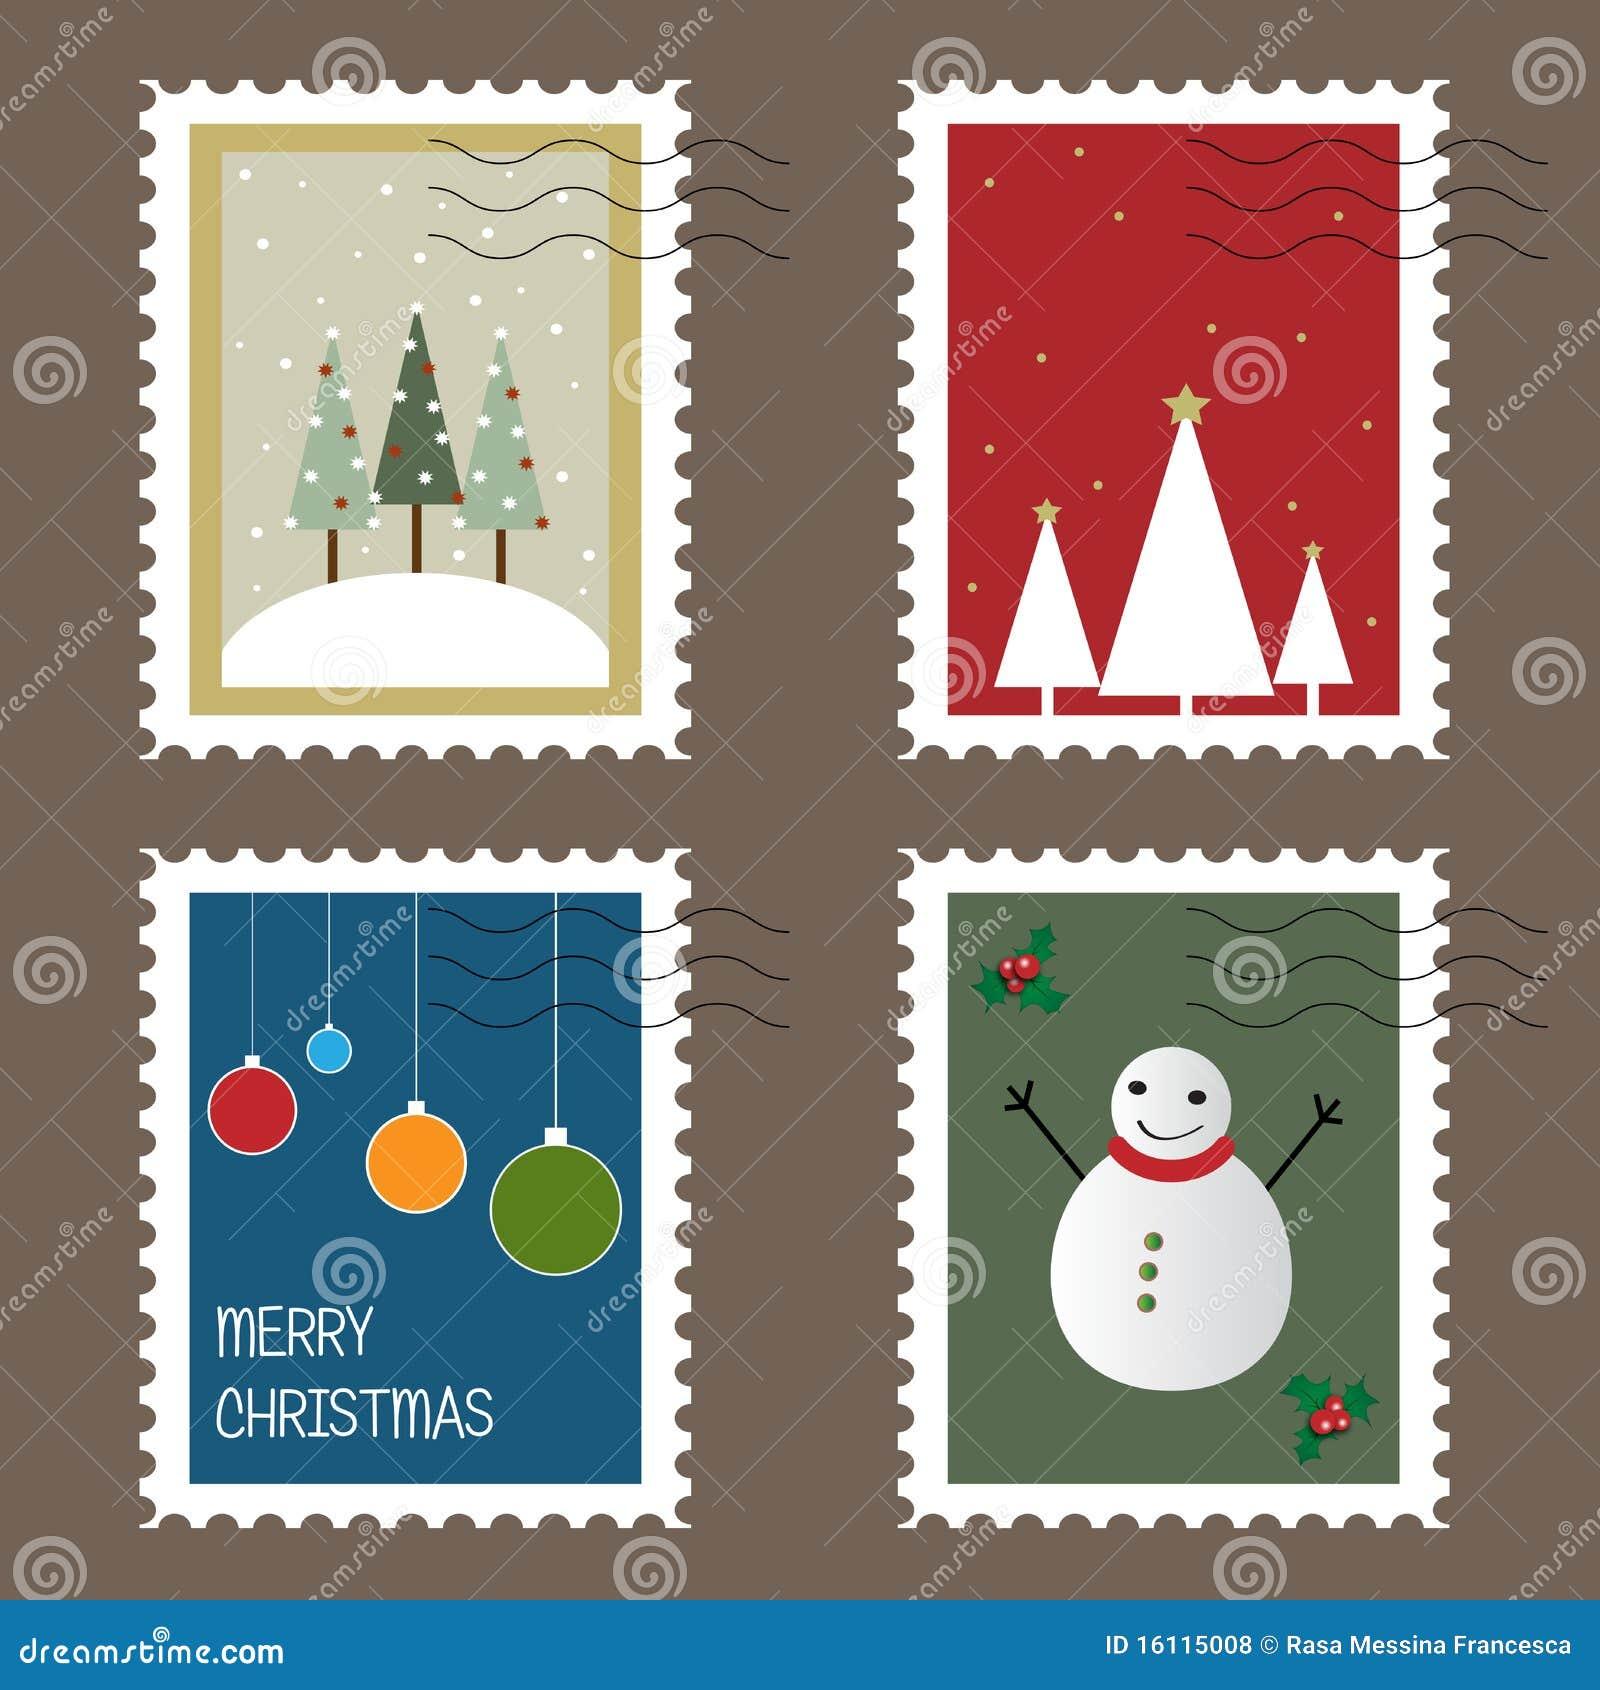 Free Christmas Tree Ornaments Clipart